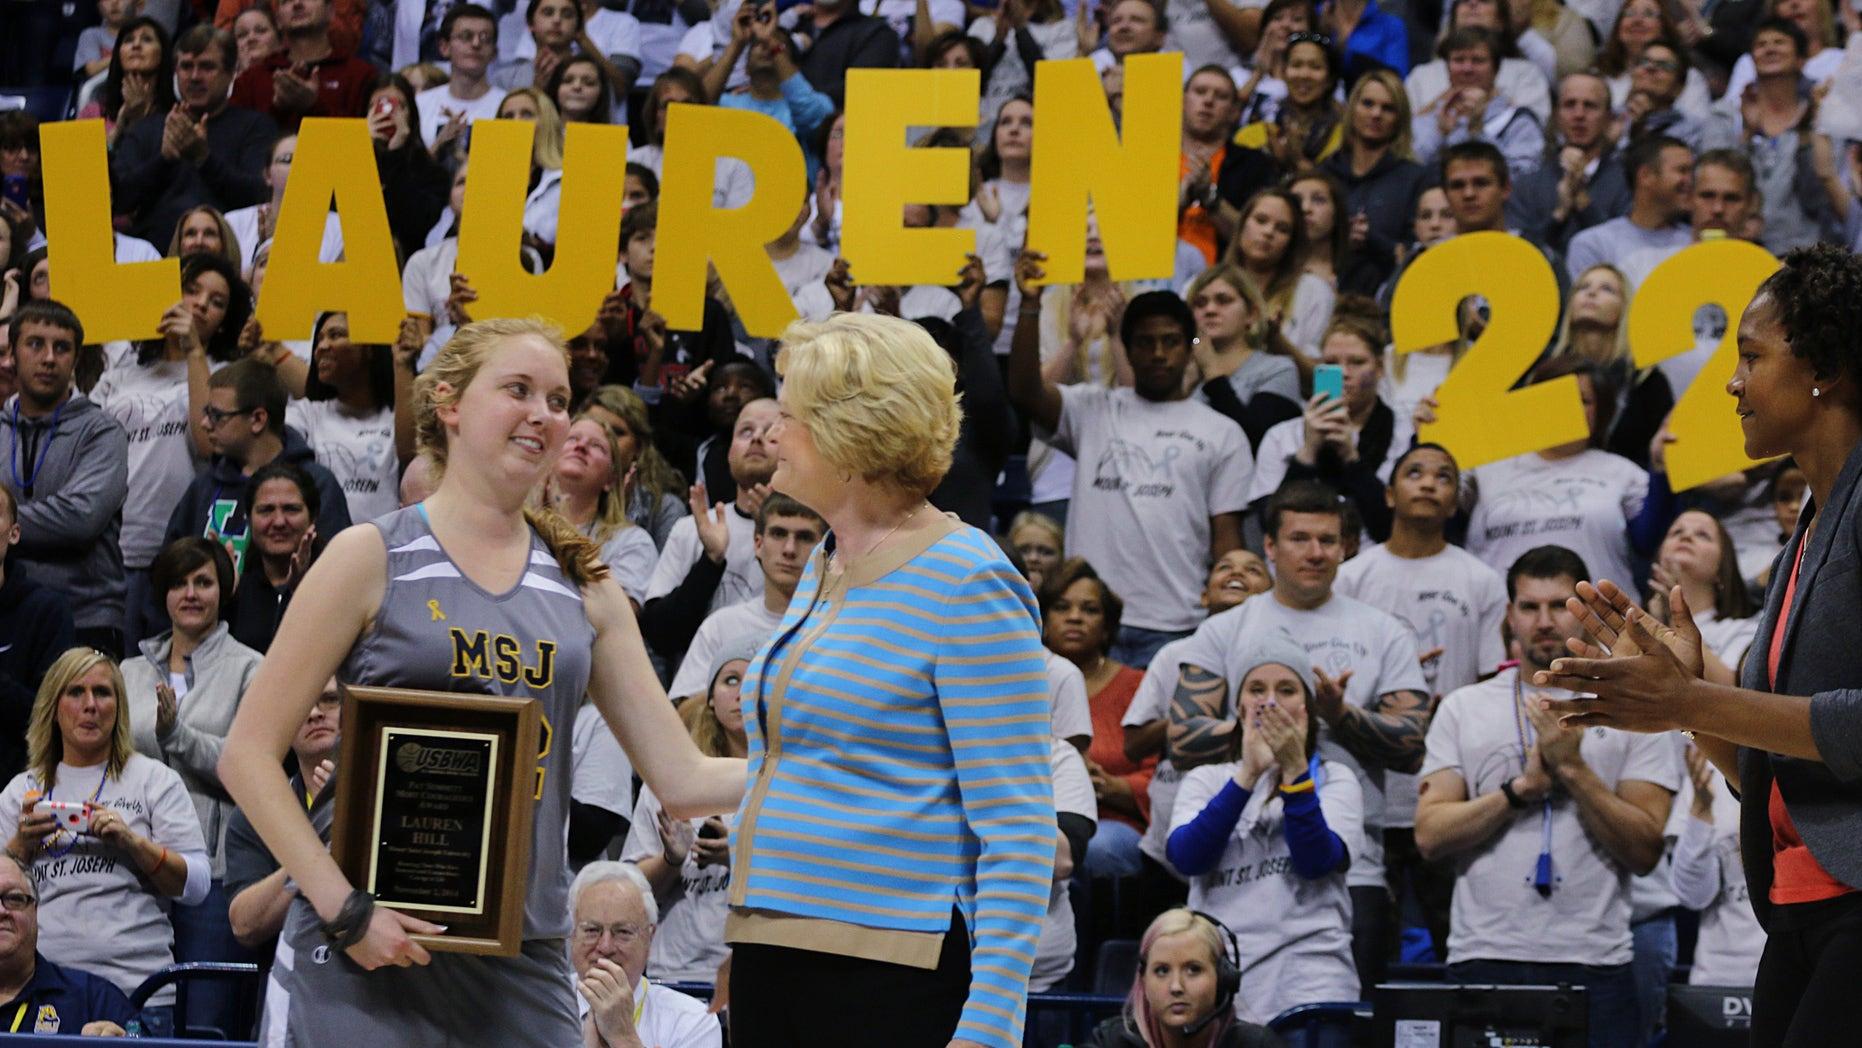 Nov. 2, 2014: Mount St. Joseph's Lauren Hill hugs Pat Summit after receiving the Pat Summitt Award during halftime of her first NCAA college basketball game against Hiram University at Xavier University in Cincinnati on Sunday